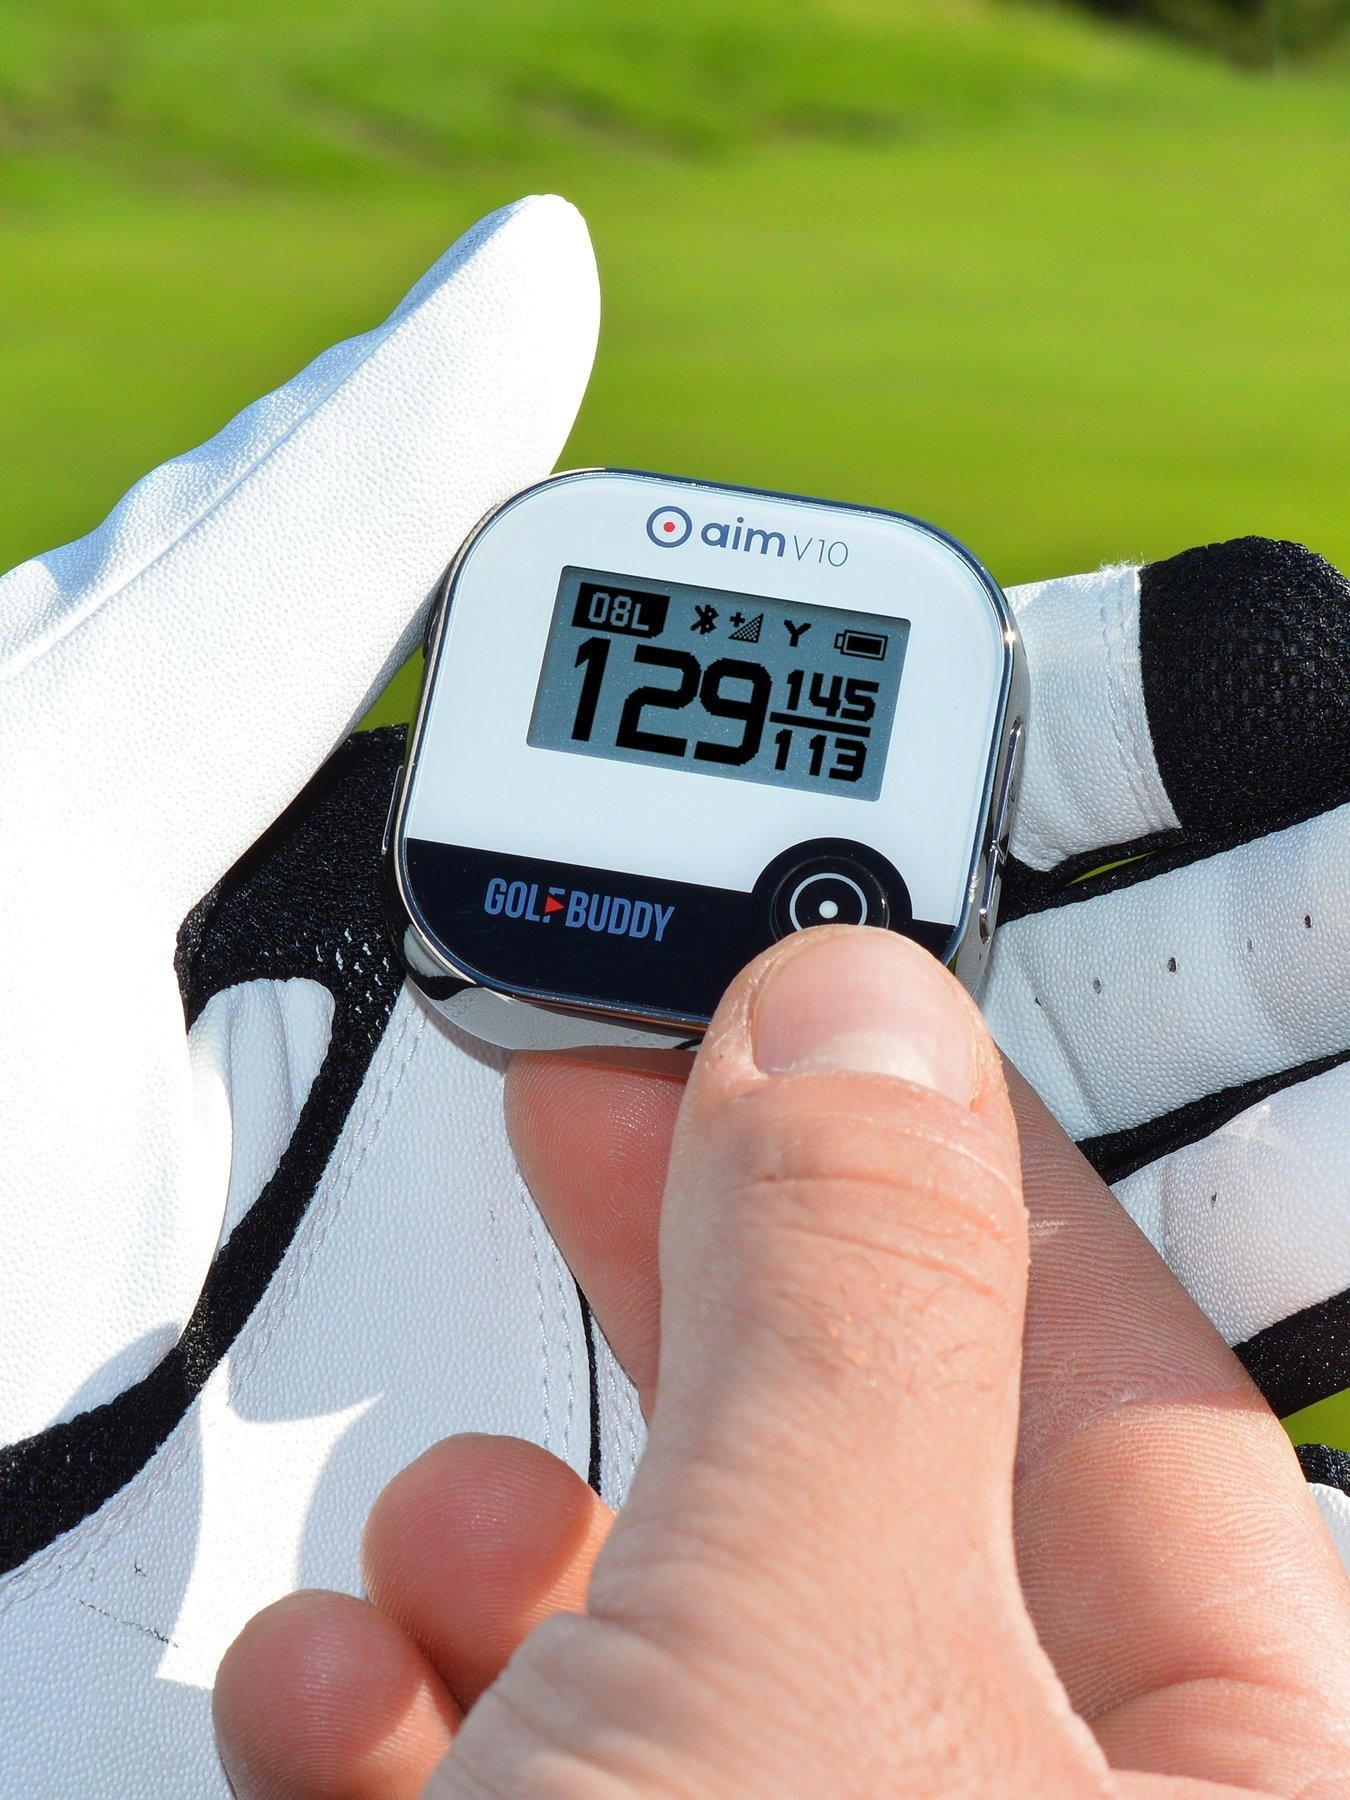 Golfbuddy Golf Buddy Aim V10 Talking Golf Gps Yardage System With Bluetooth Technology - One Colour - #bluetoothtechnology